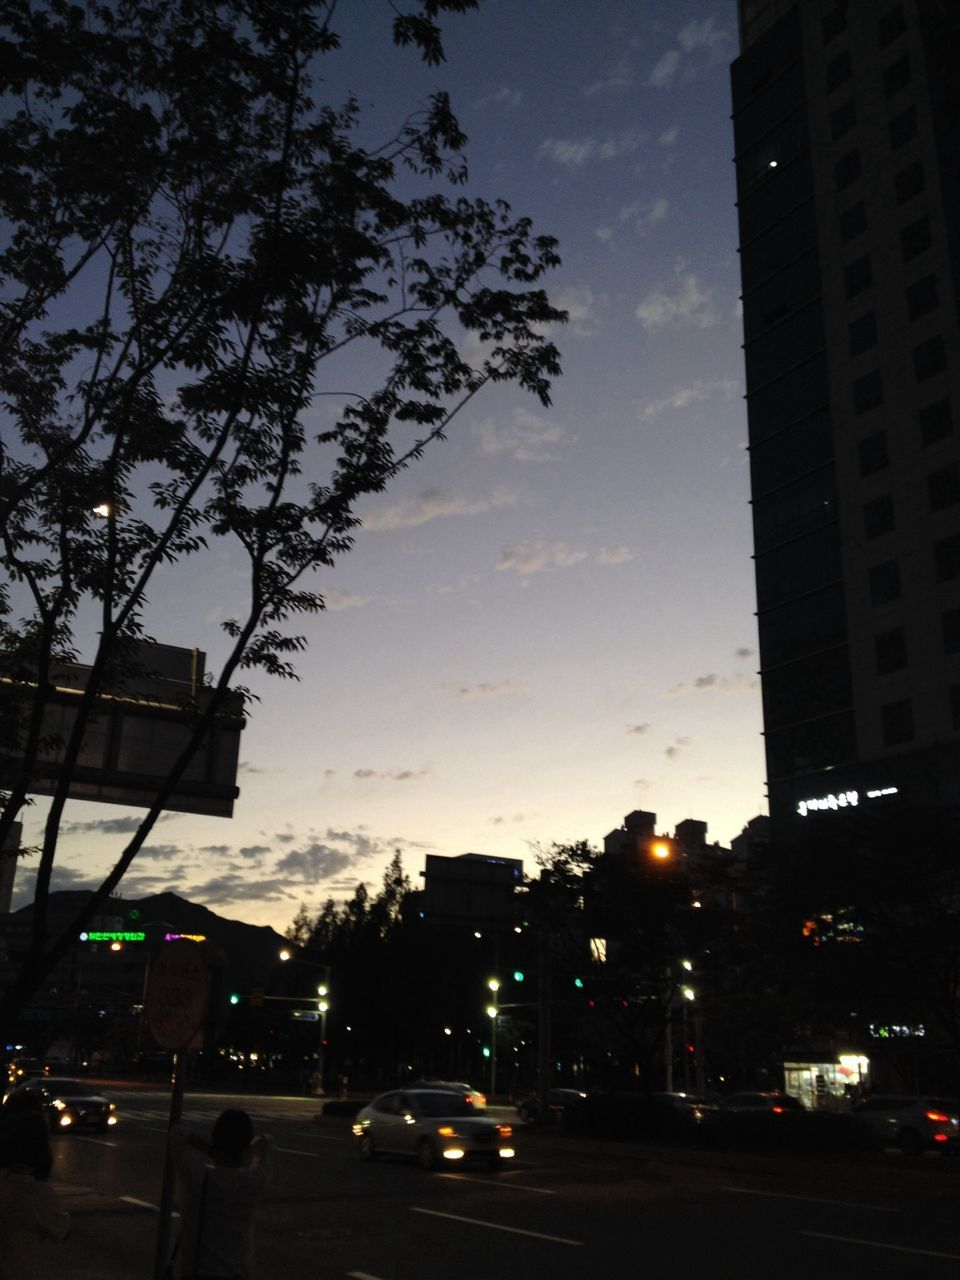 Illuminated City Street By Building Against Sky At Dusk